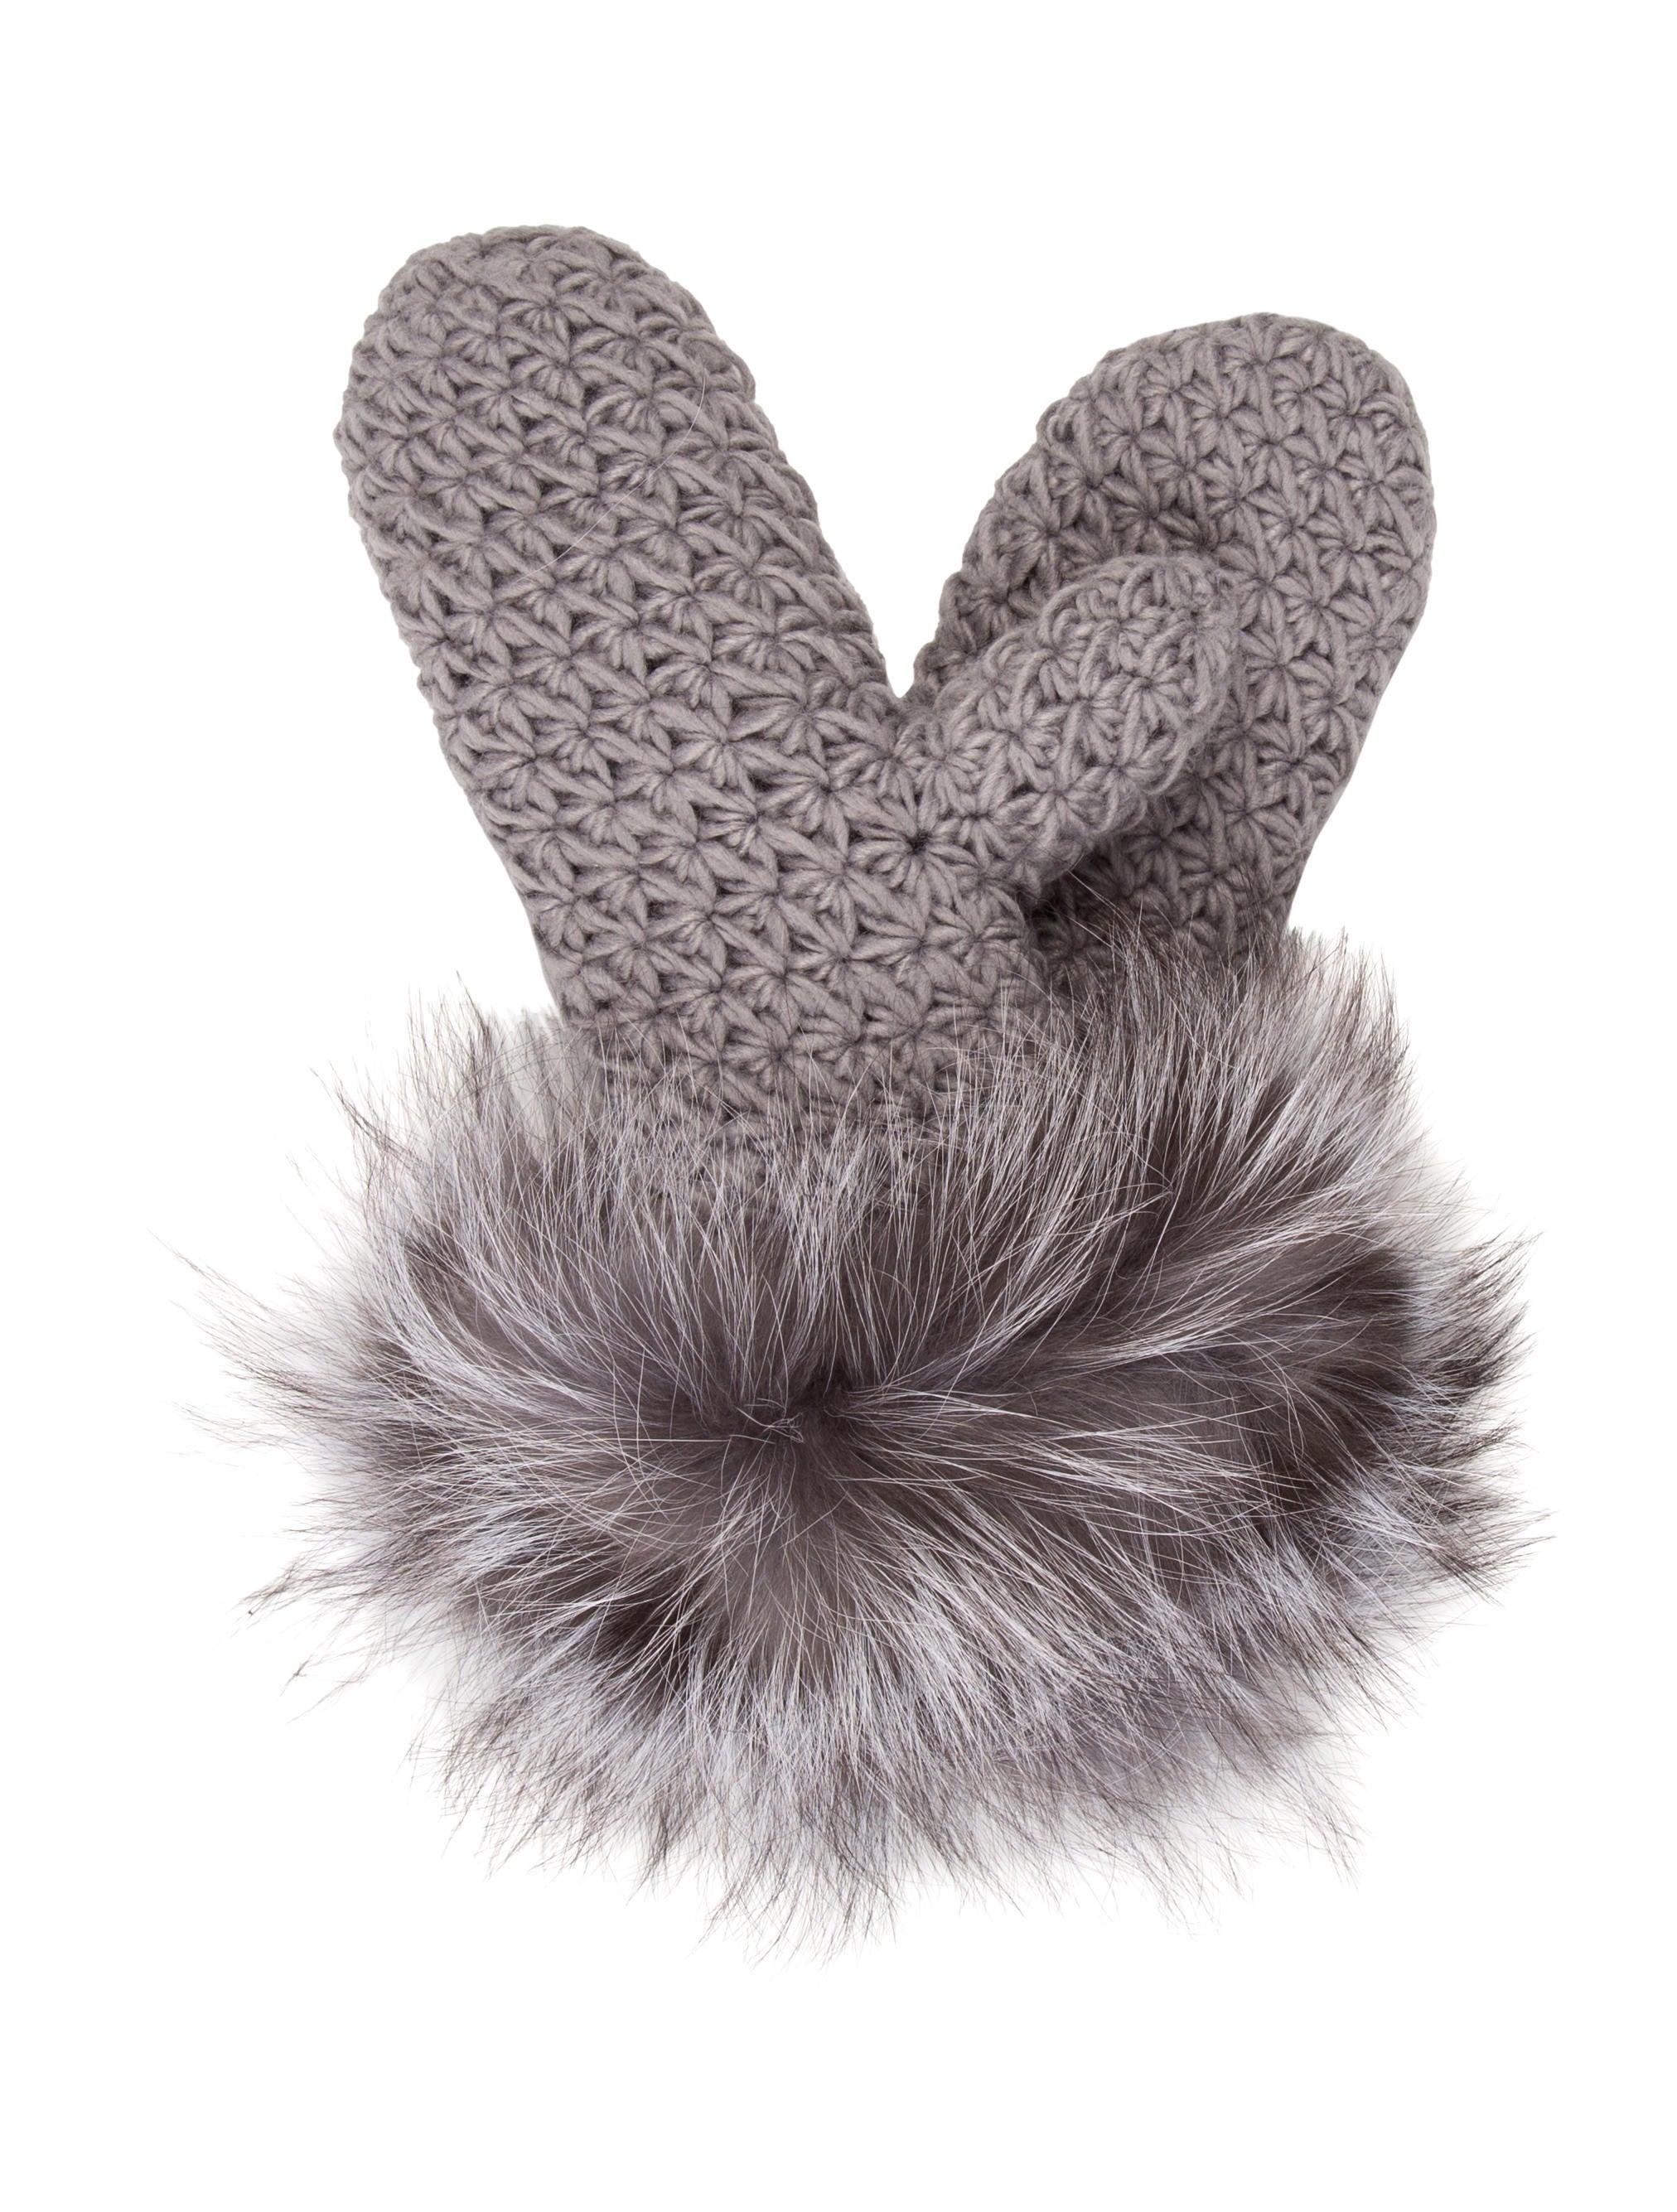 5d719a43632 Saks Fifth Avenue Fur Knit Mittens w  Tags - Accessories - SKS20929 ...